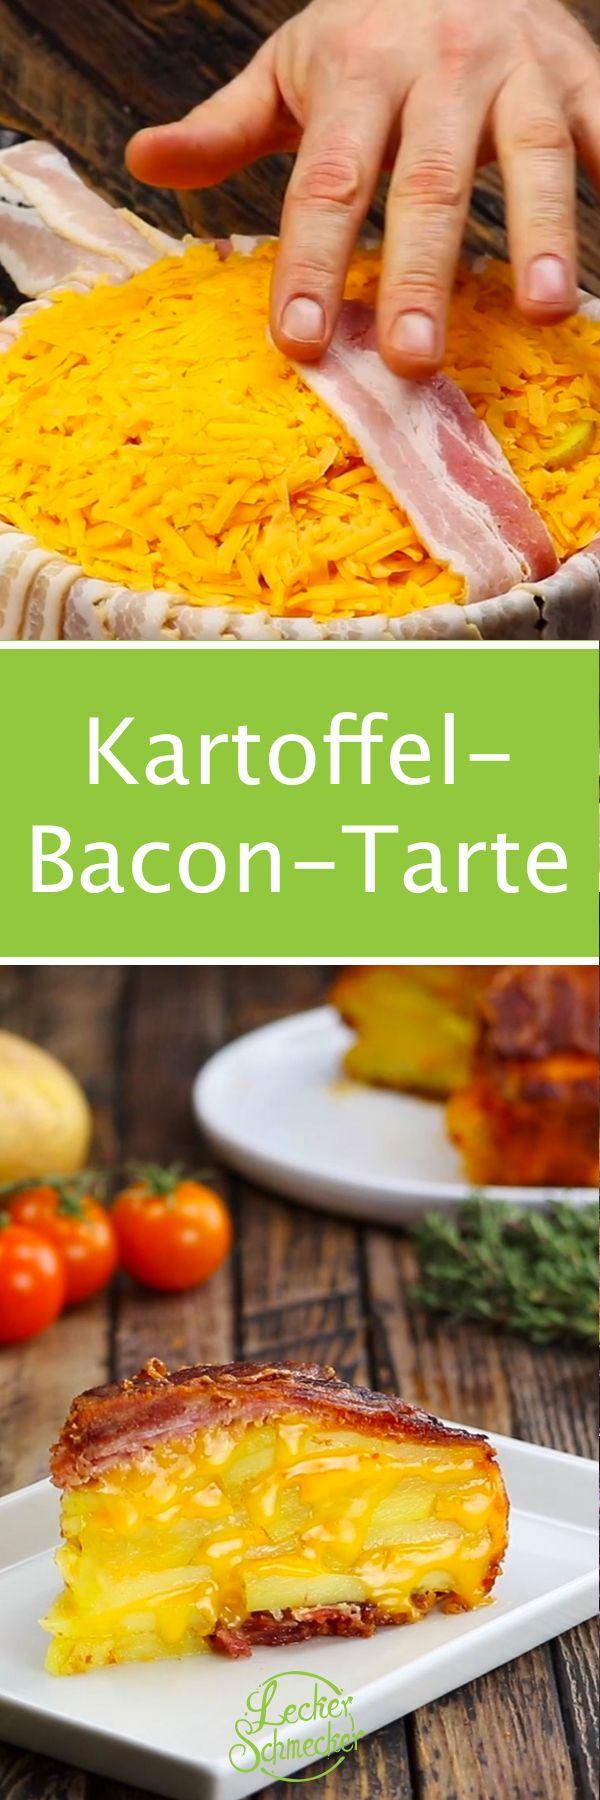 Kartoffel-Bacon-Tarte im Knuspermantel.